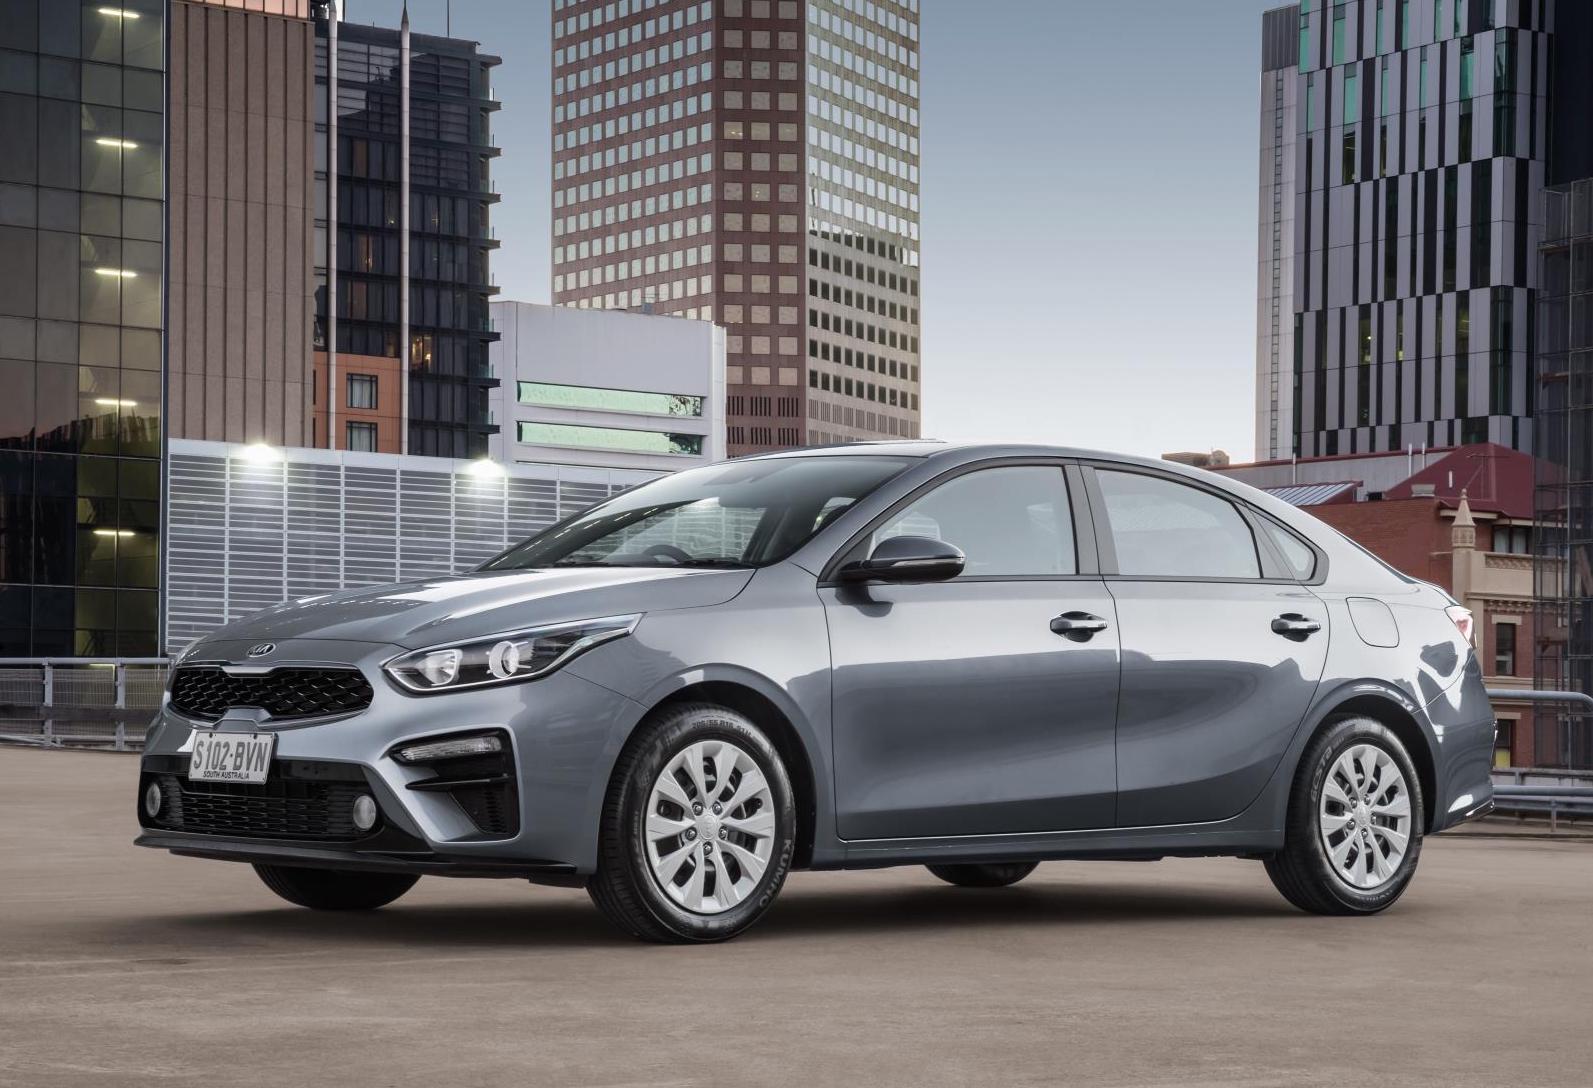 2019 Kia Cerato Now On Sale In Australia From $19,990